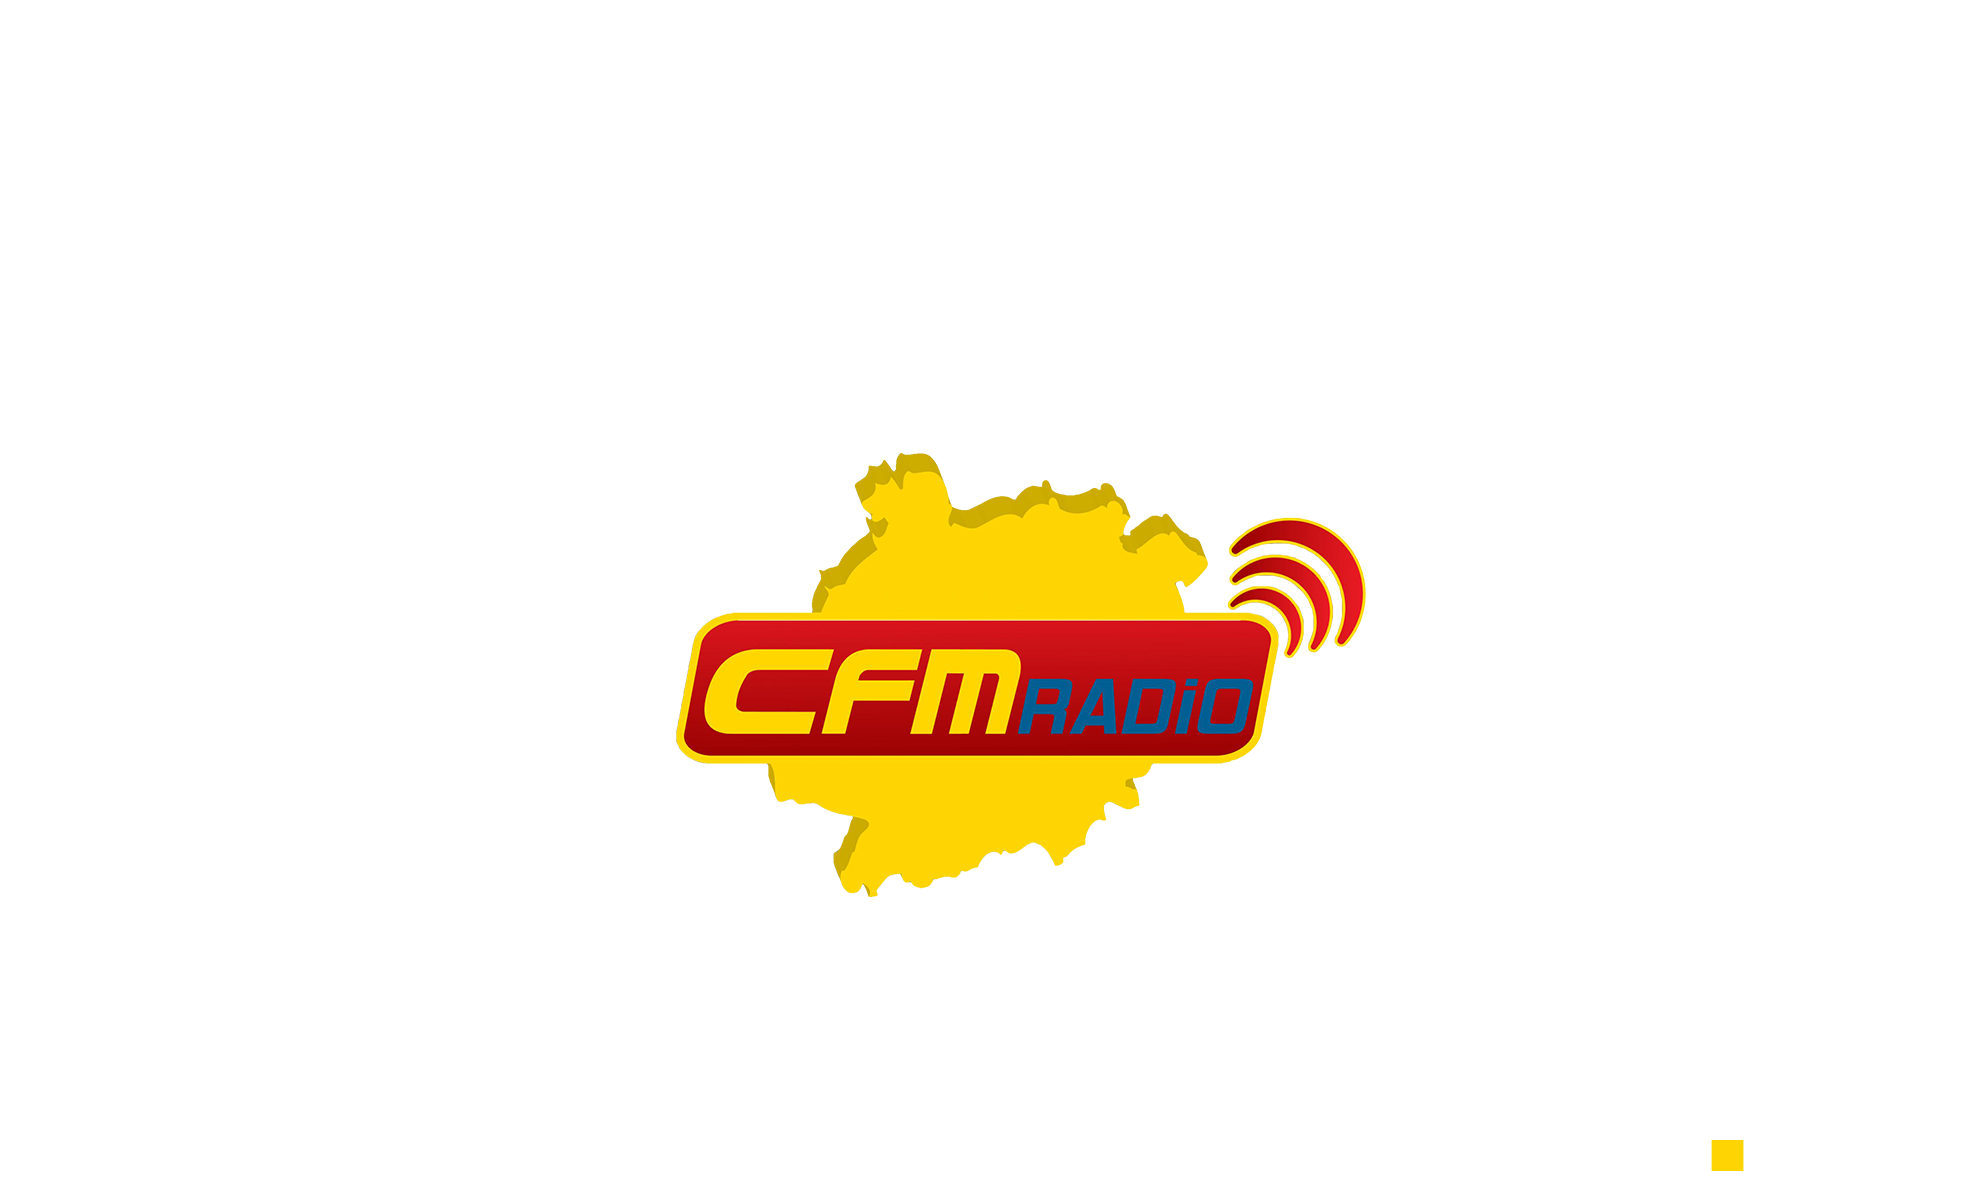 CFM LOGO PAGE ACCUEIL